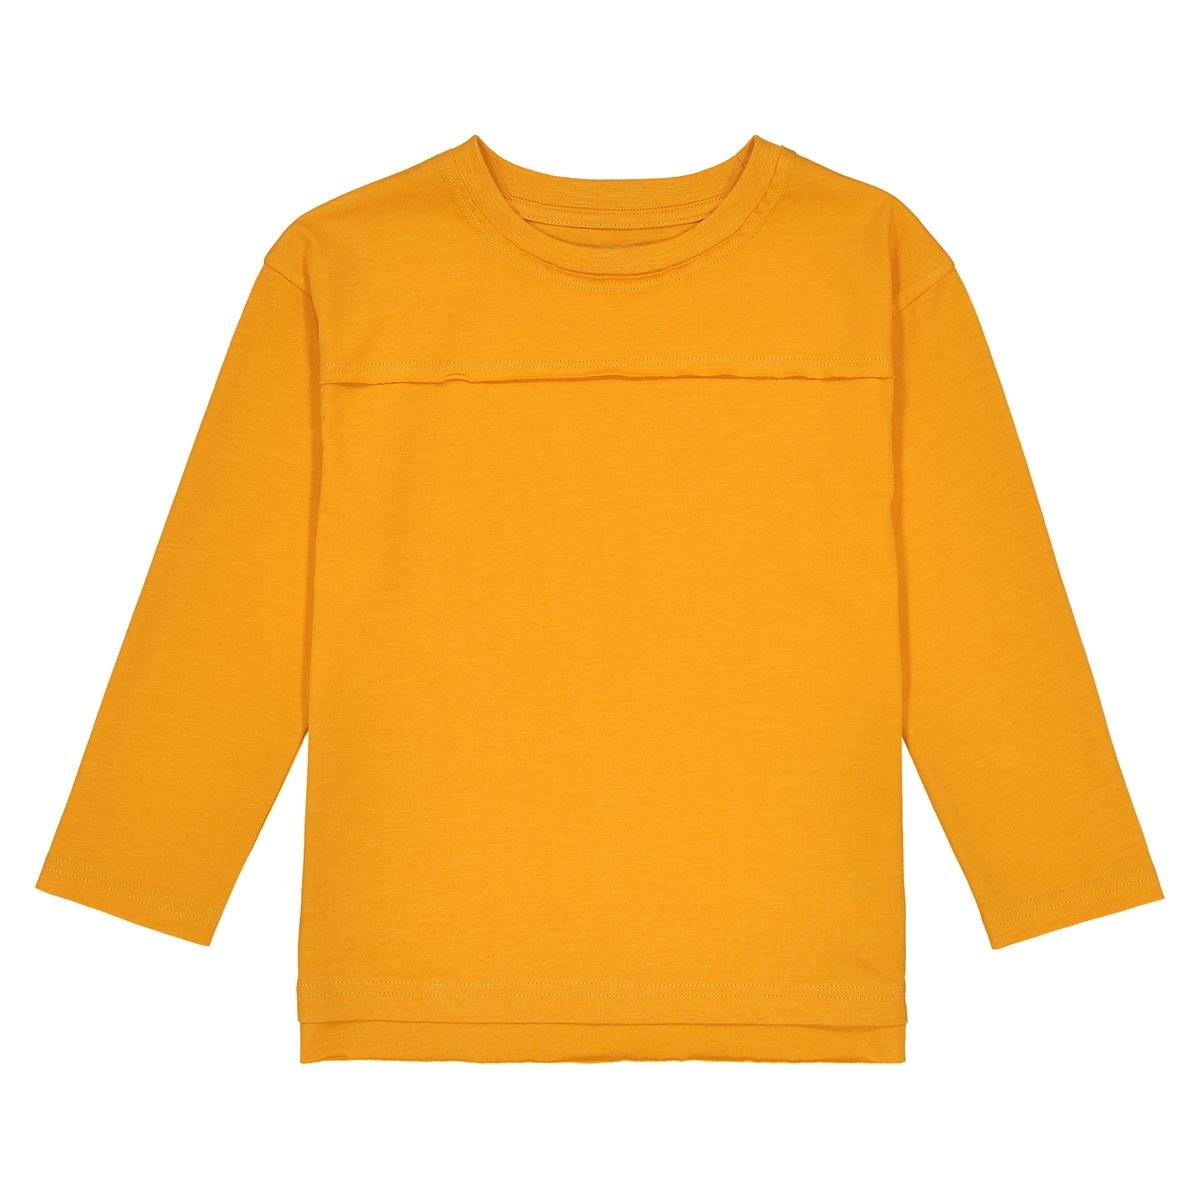 T-shirt oversize de mangas compridas, 3-12 anos